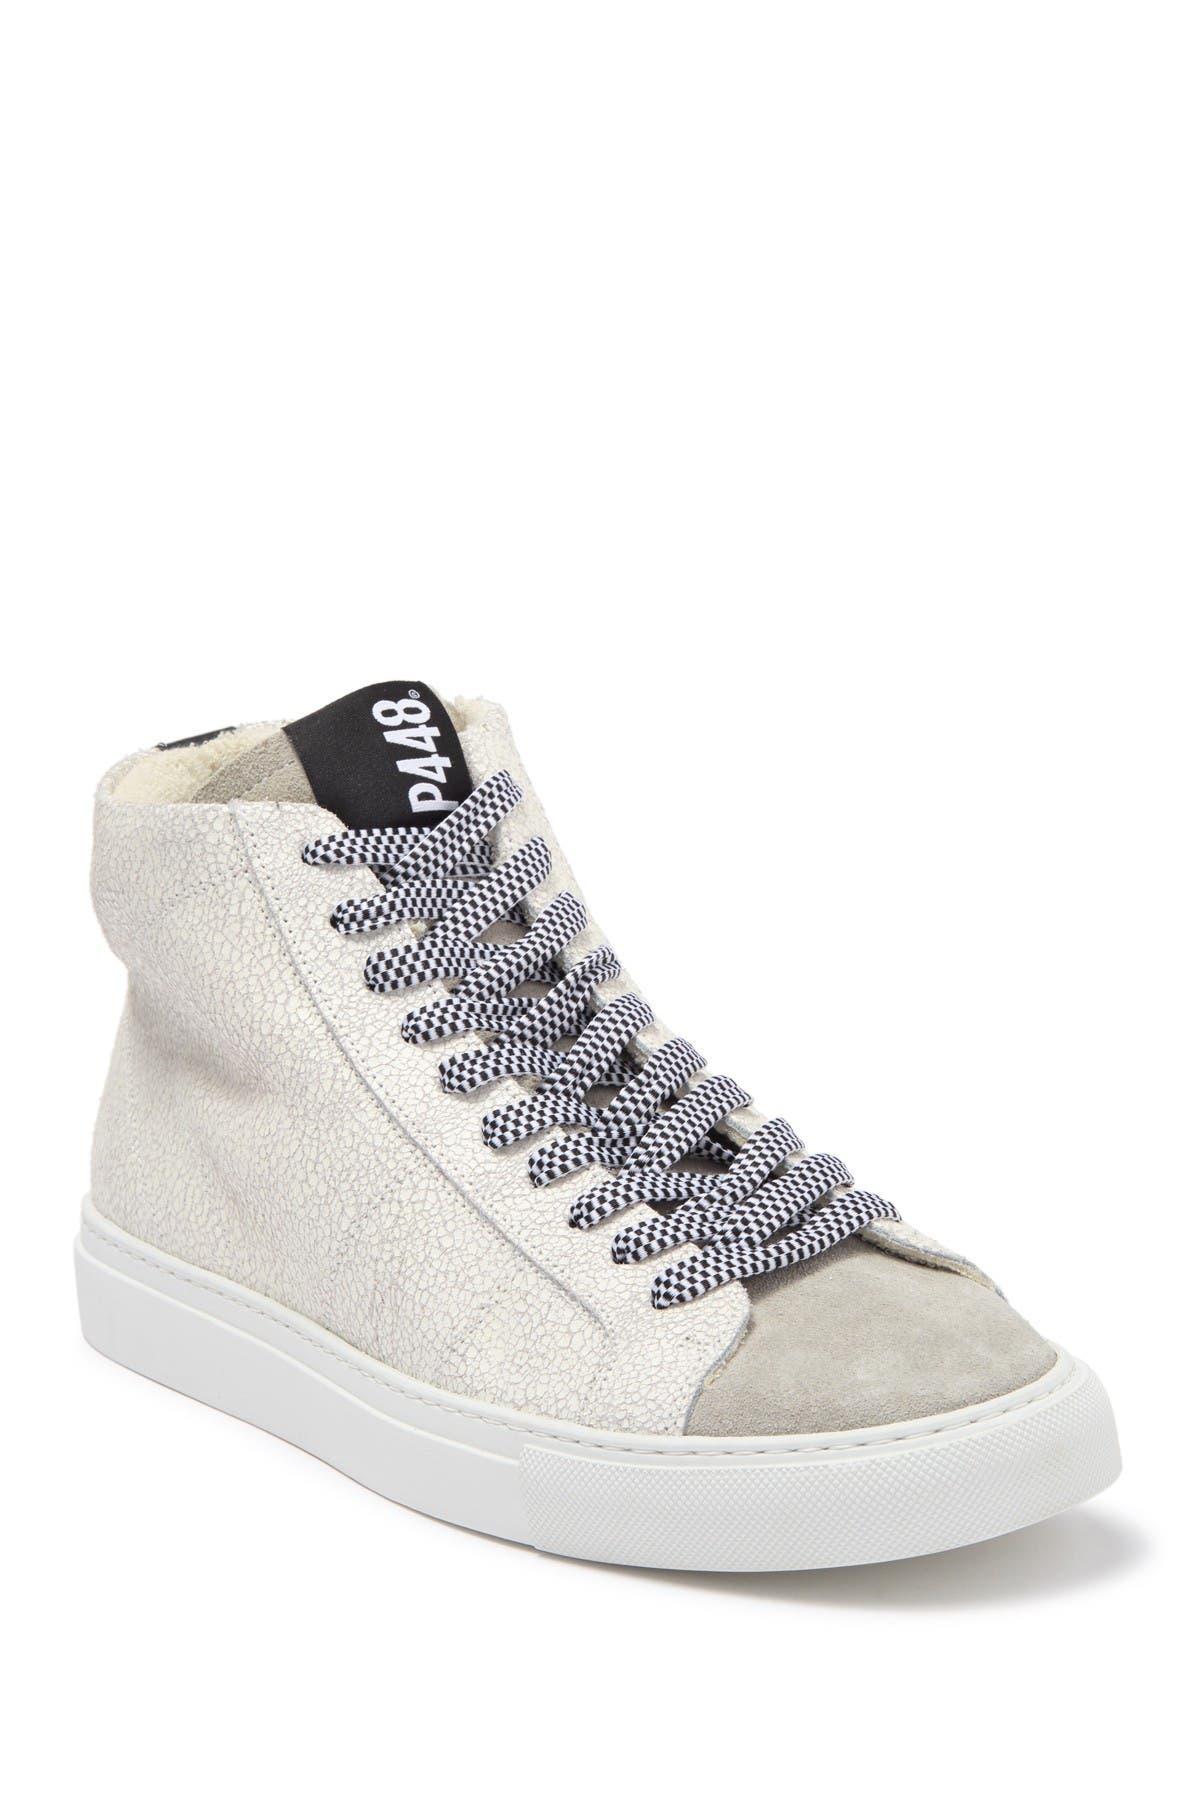 E9 Star 2.0 High-Tip Leather Sneaker